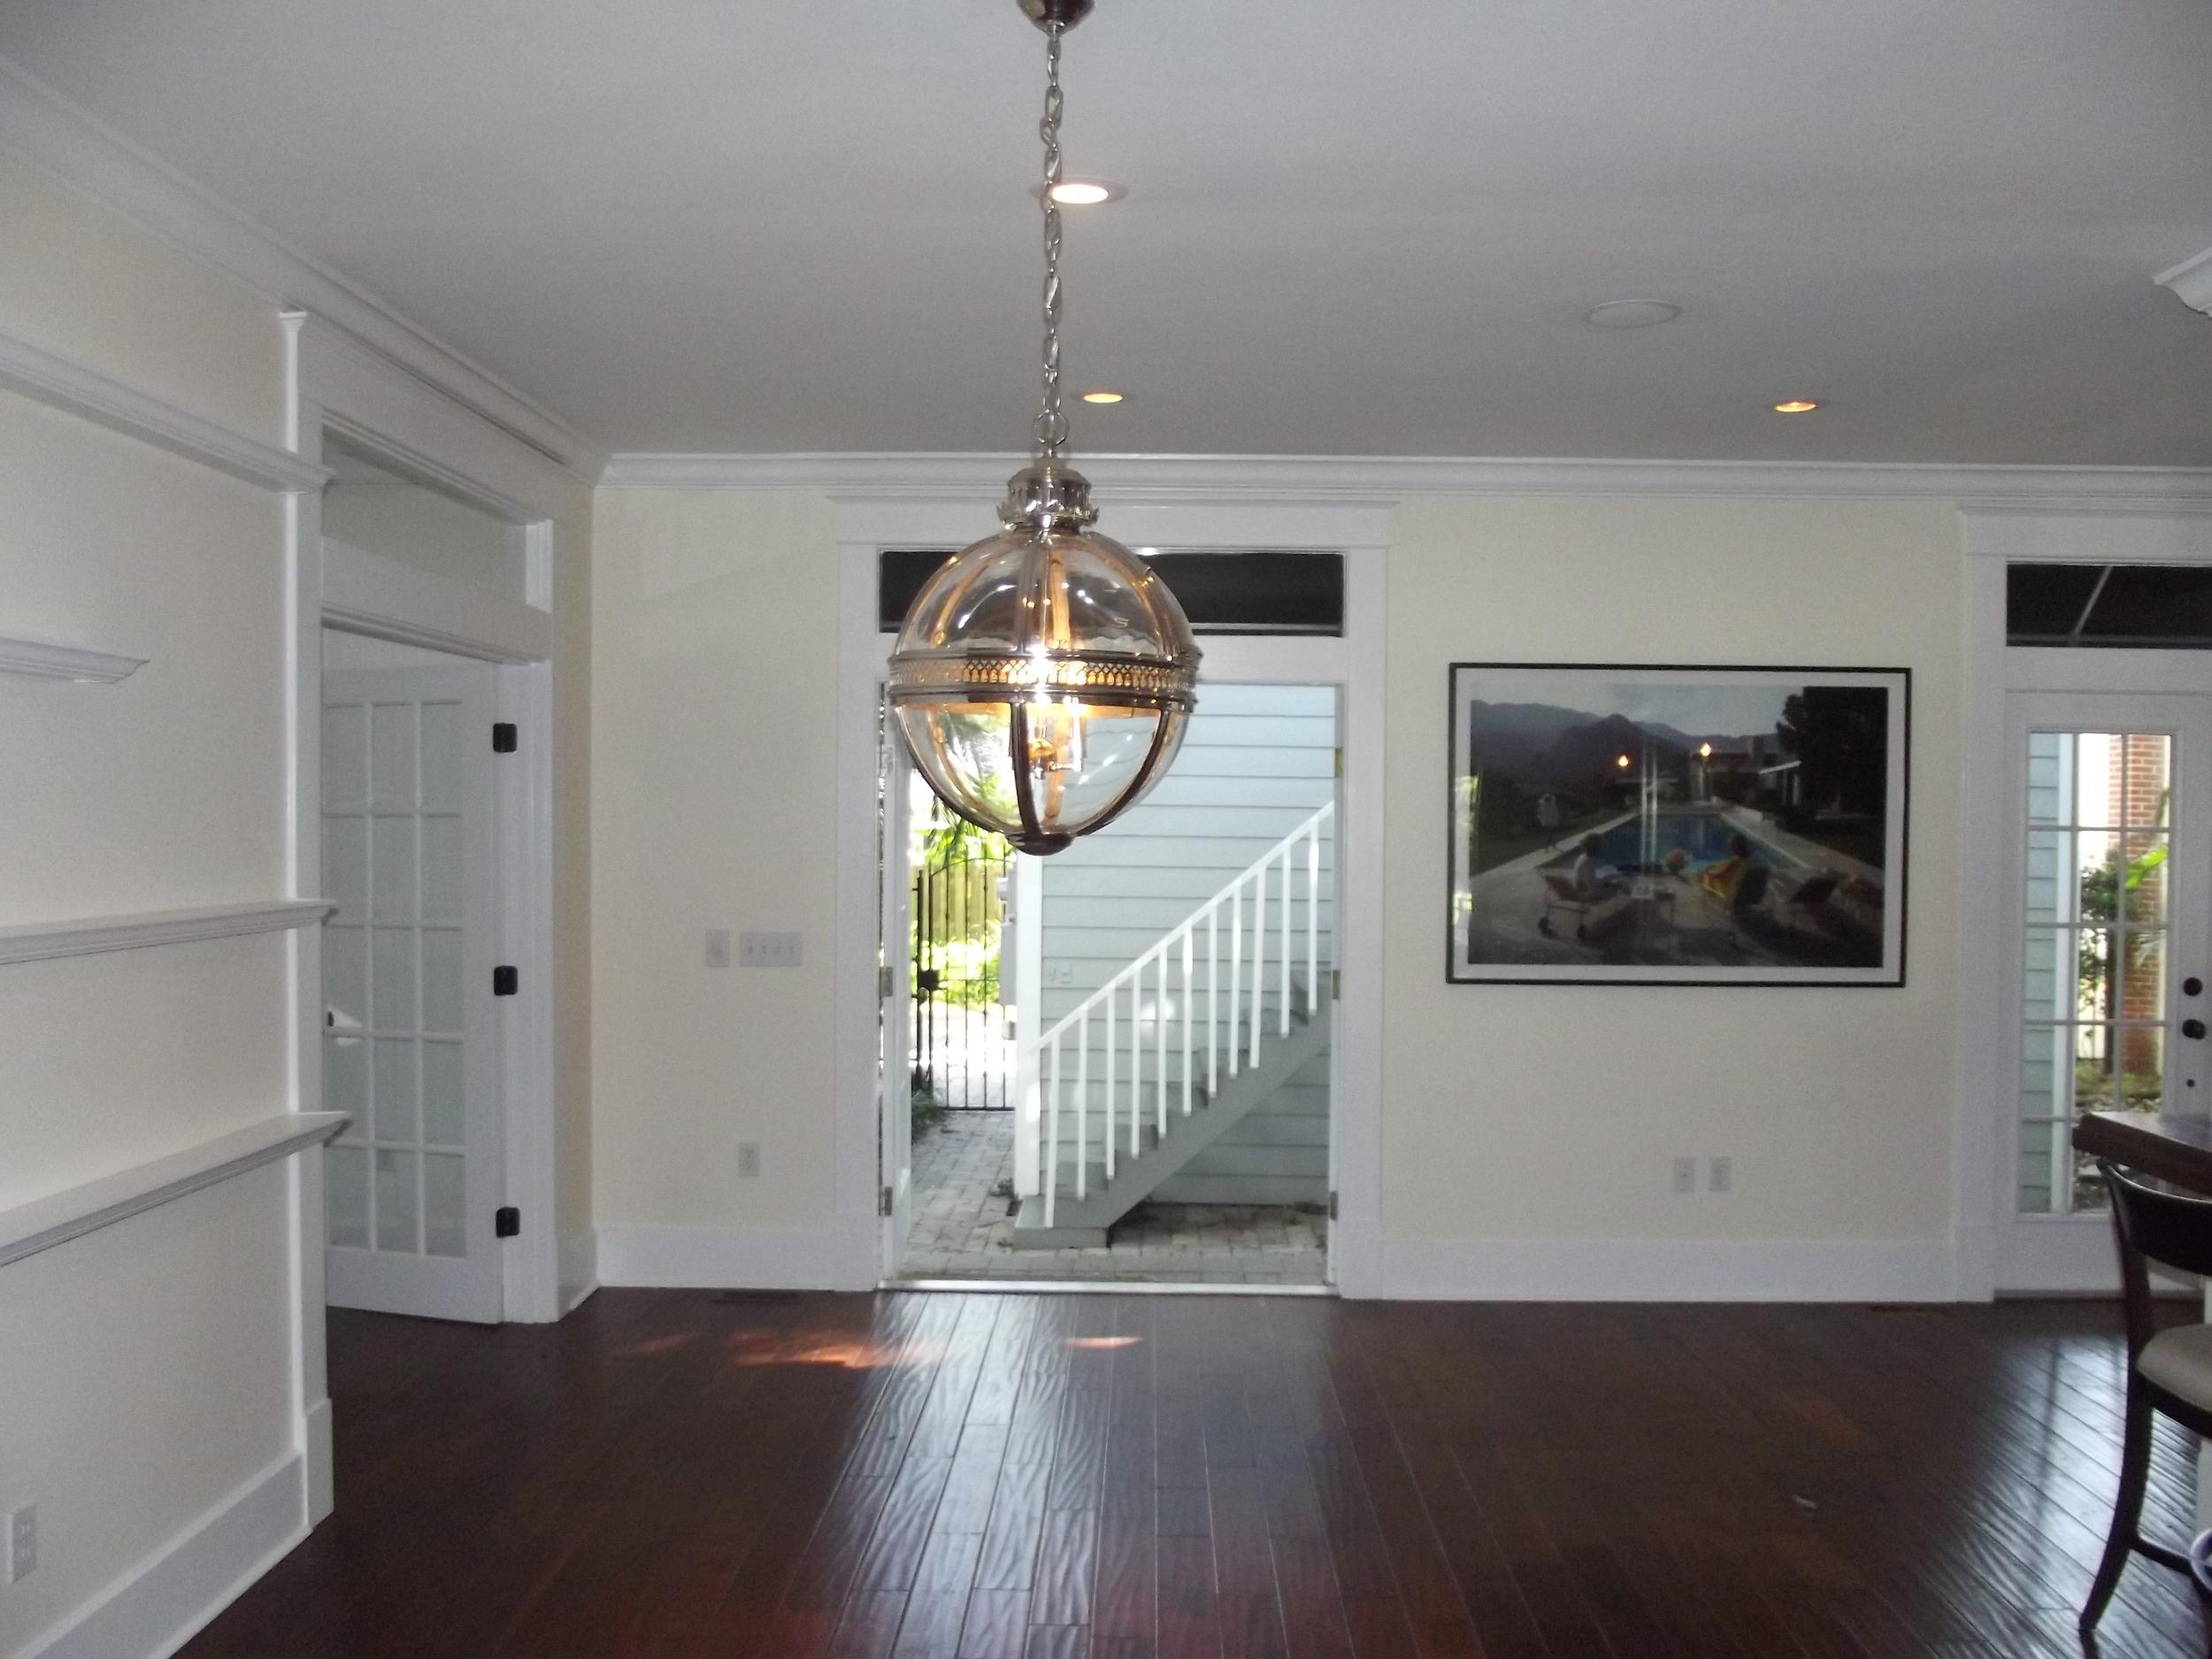 interior_before_lisagilmoredesign